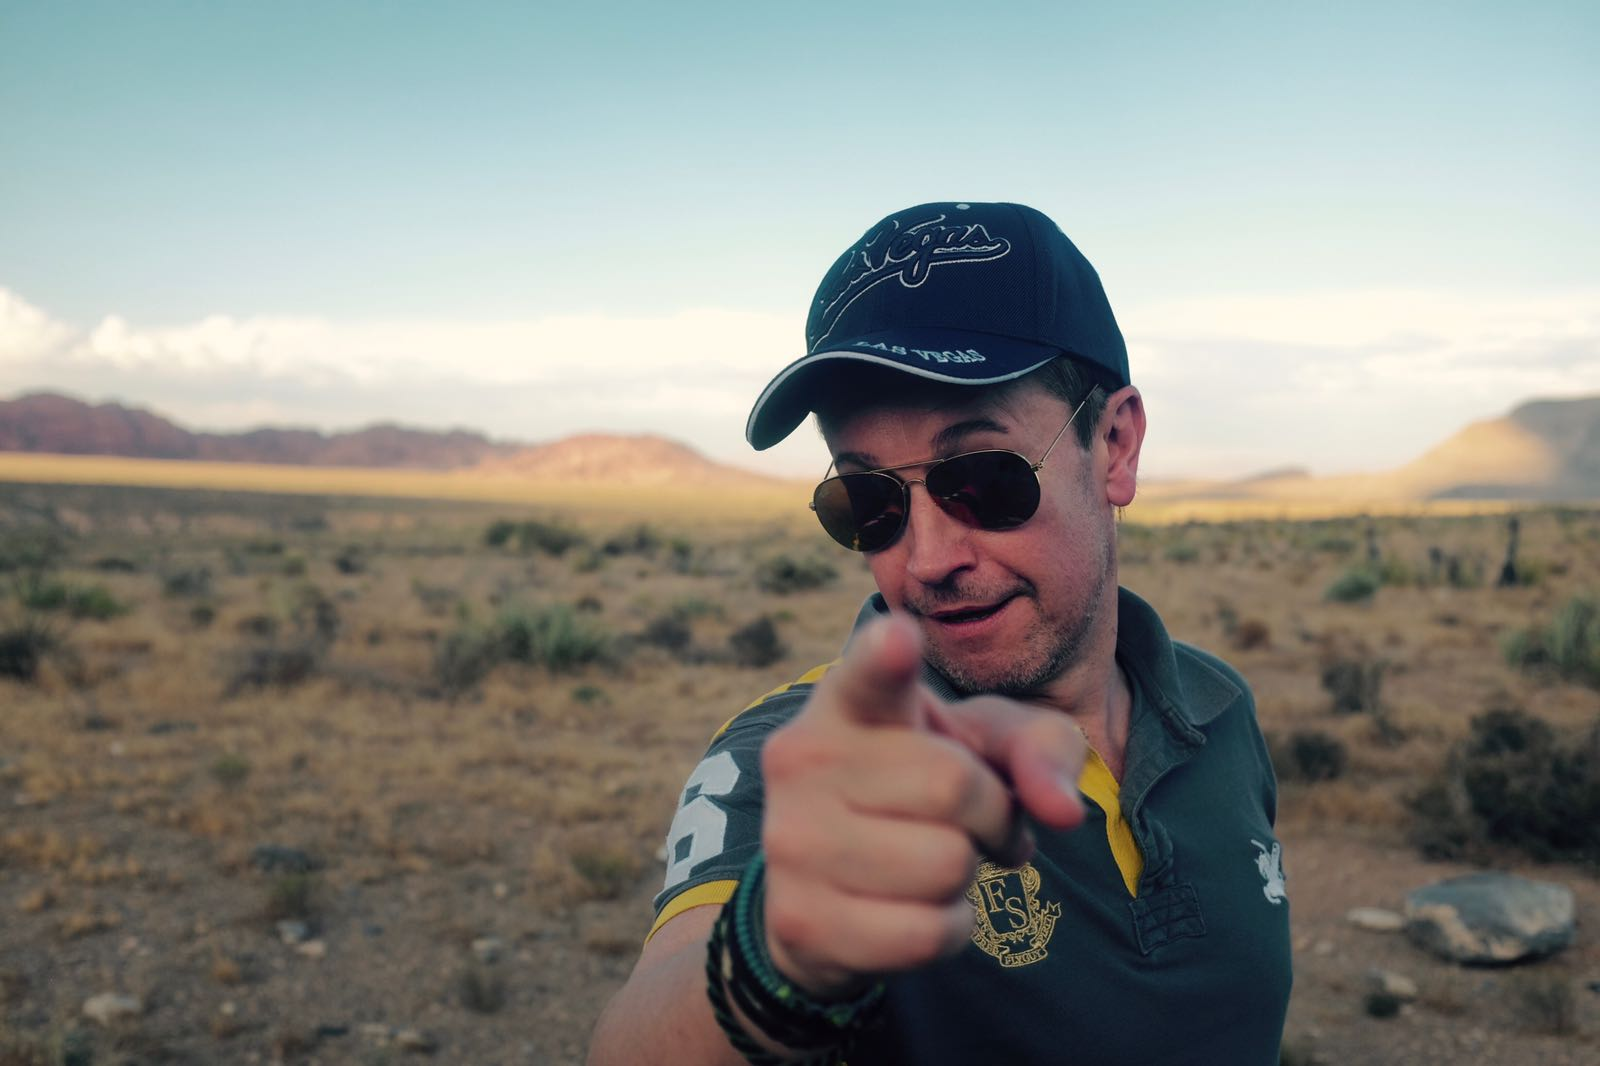 Dan in the desert